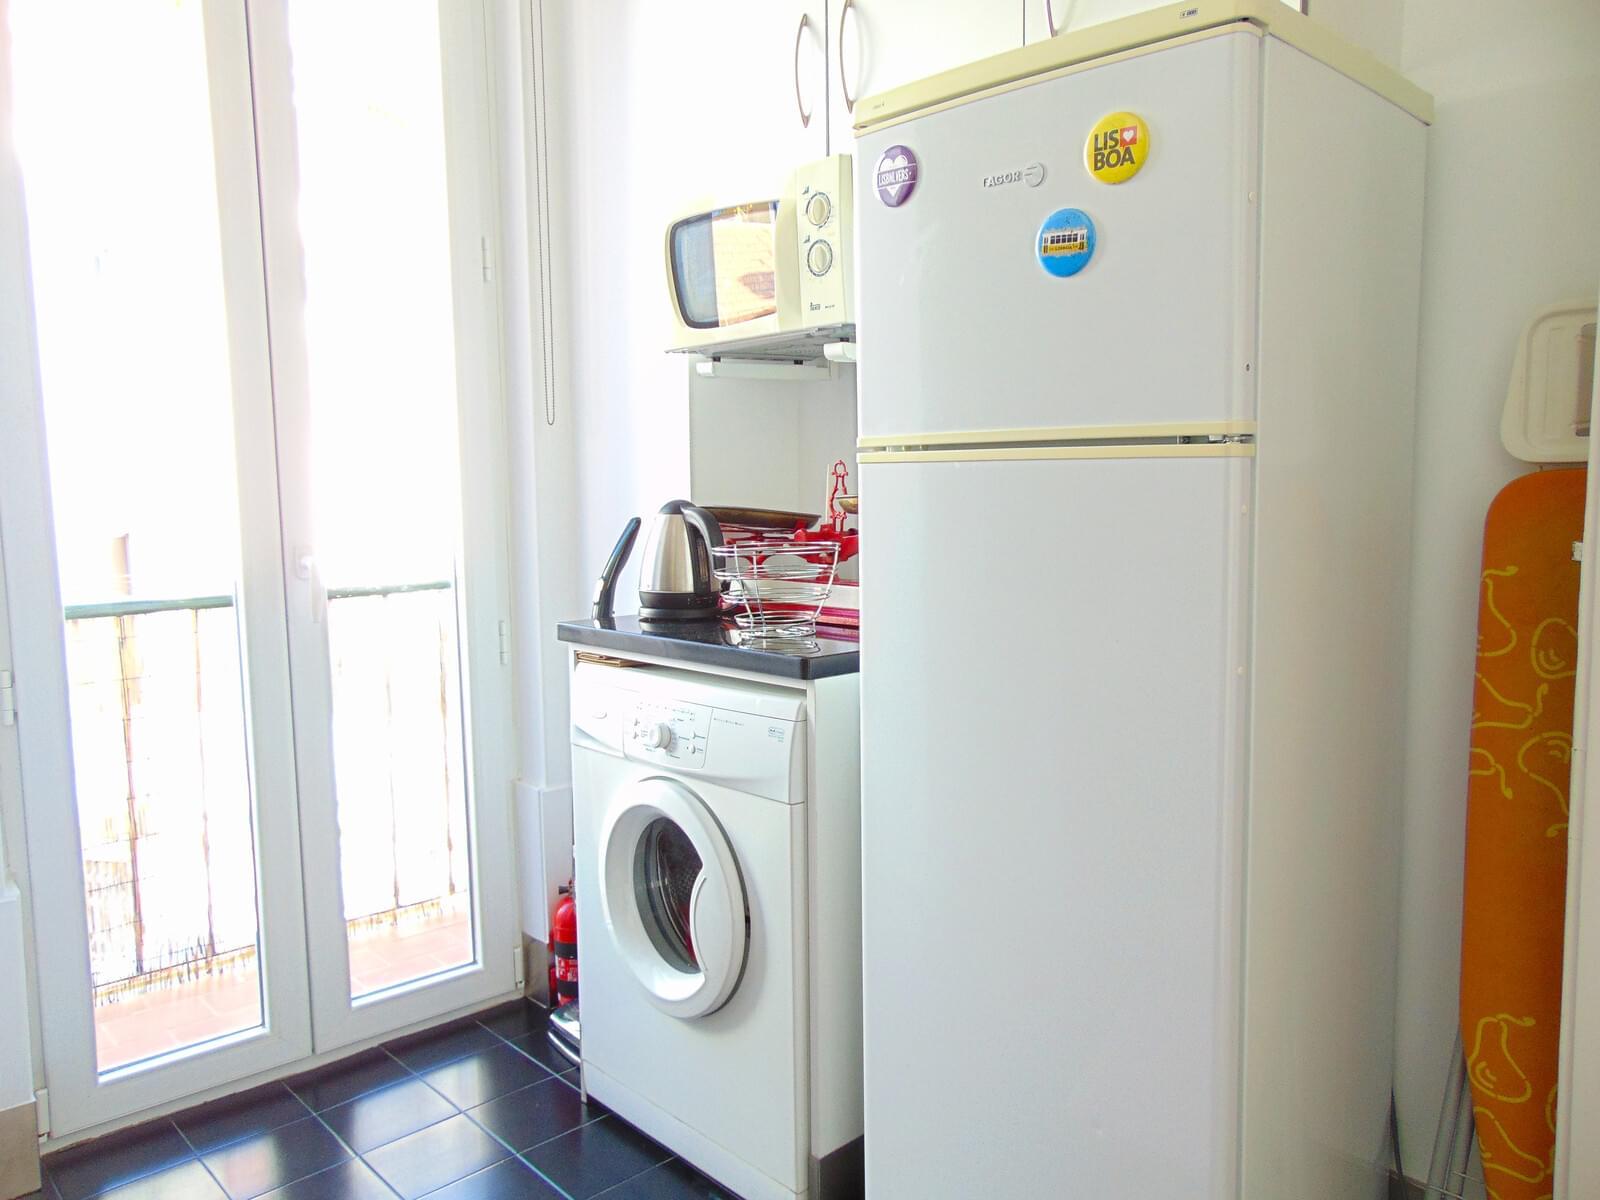 pf18269-apartamento-t1-lisboa-7c7481dc-f6b4-4d25-99d2-6828a6a38b15